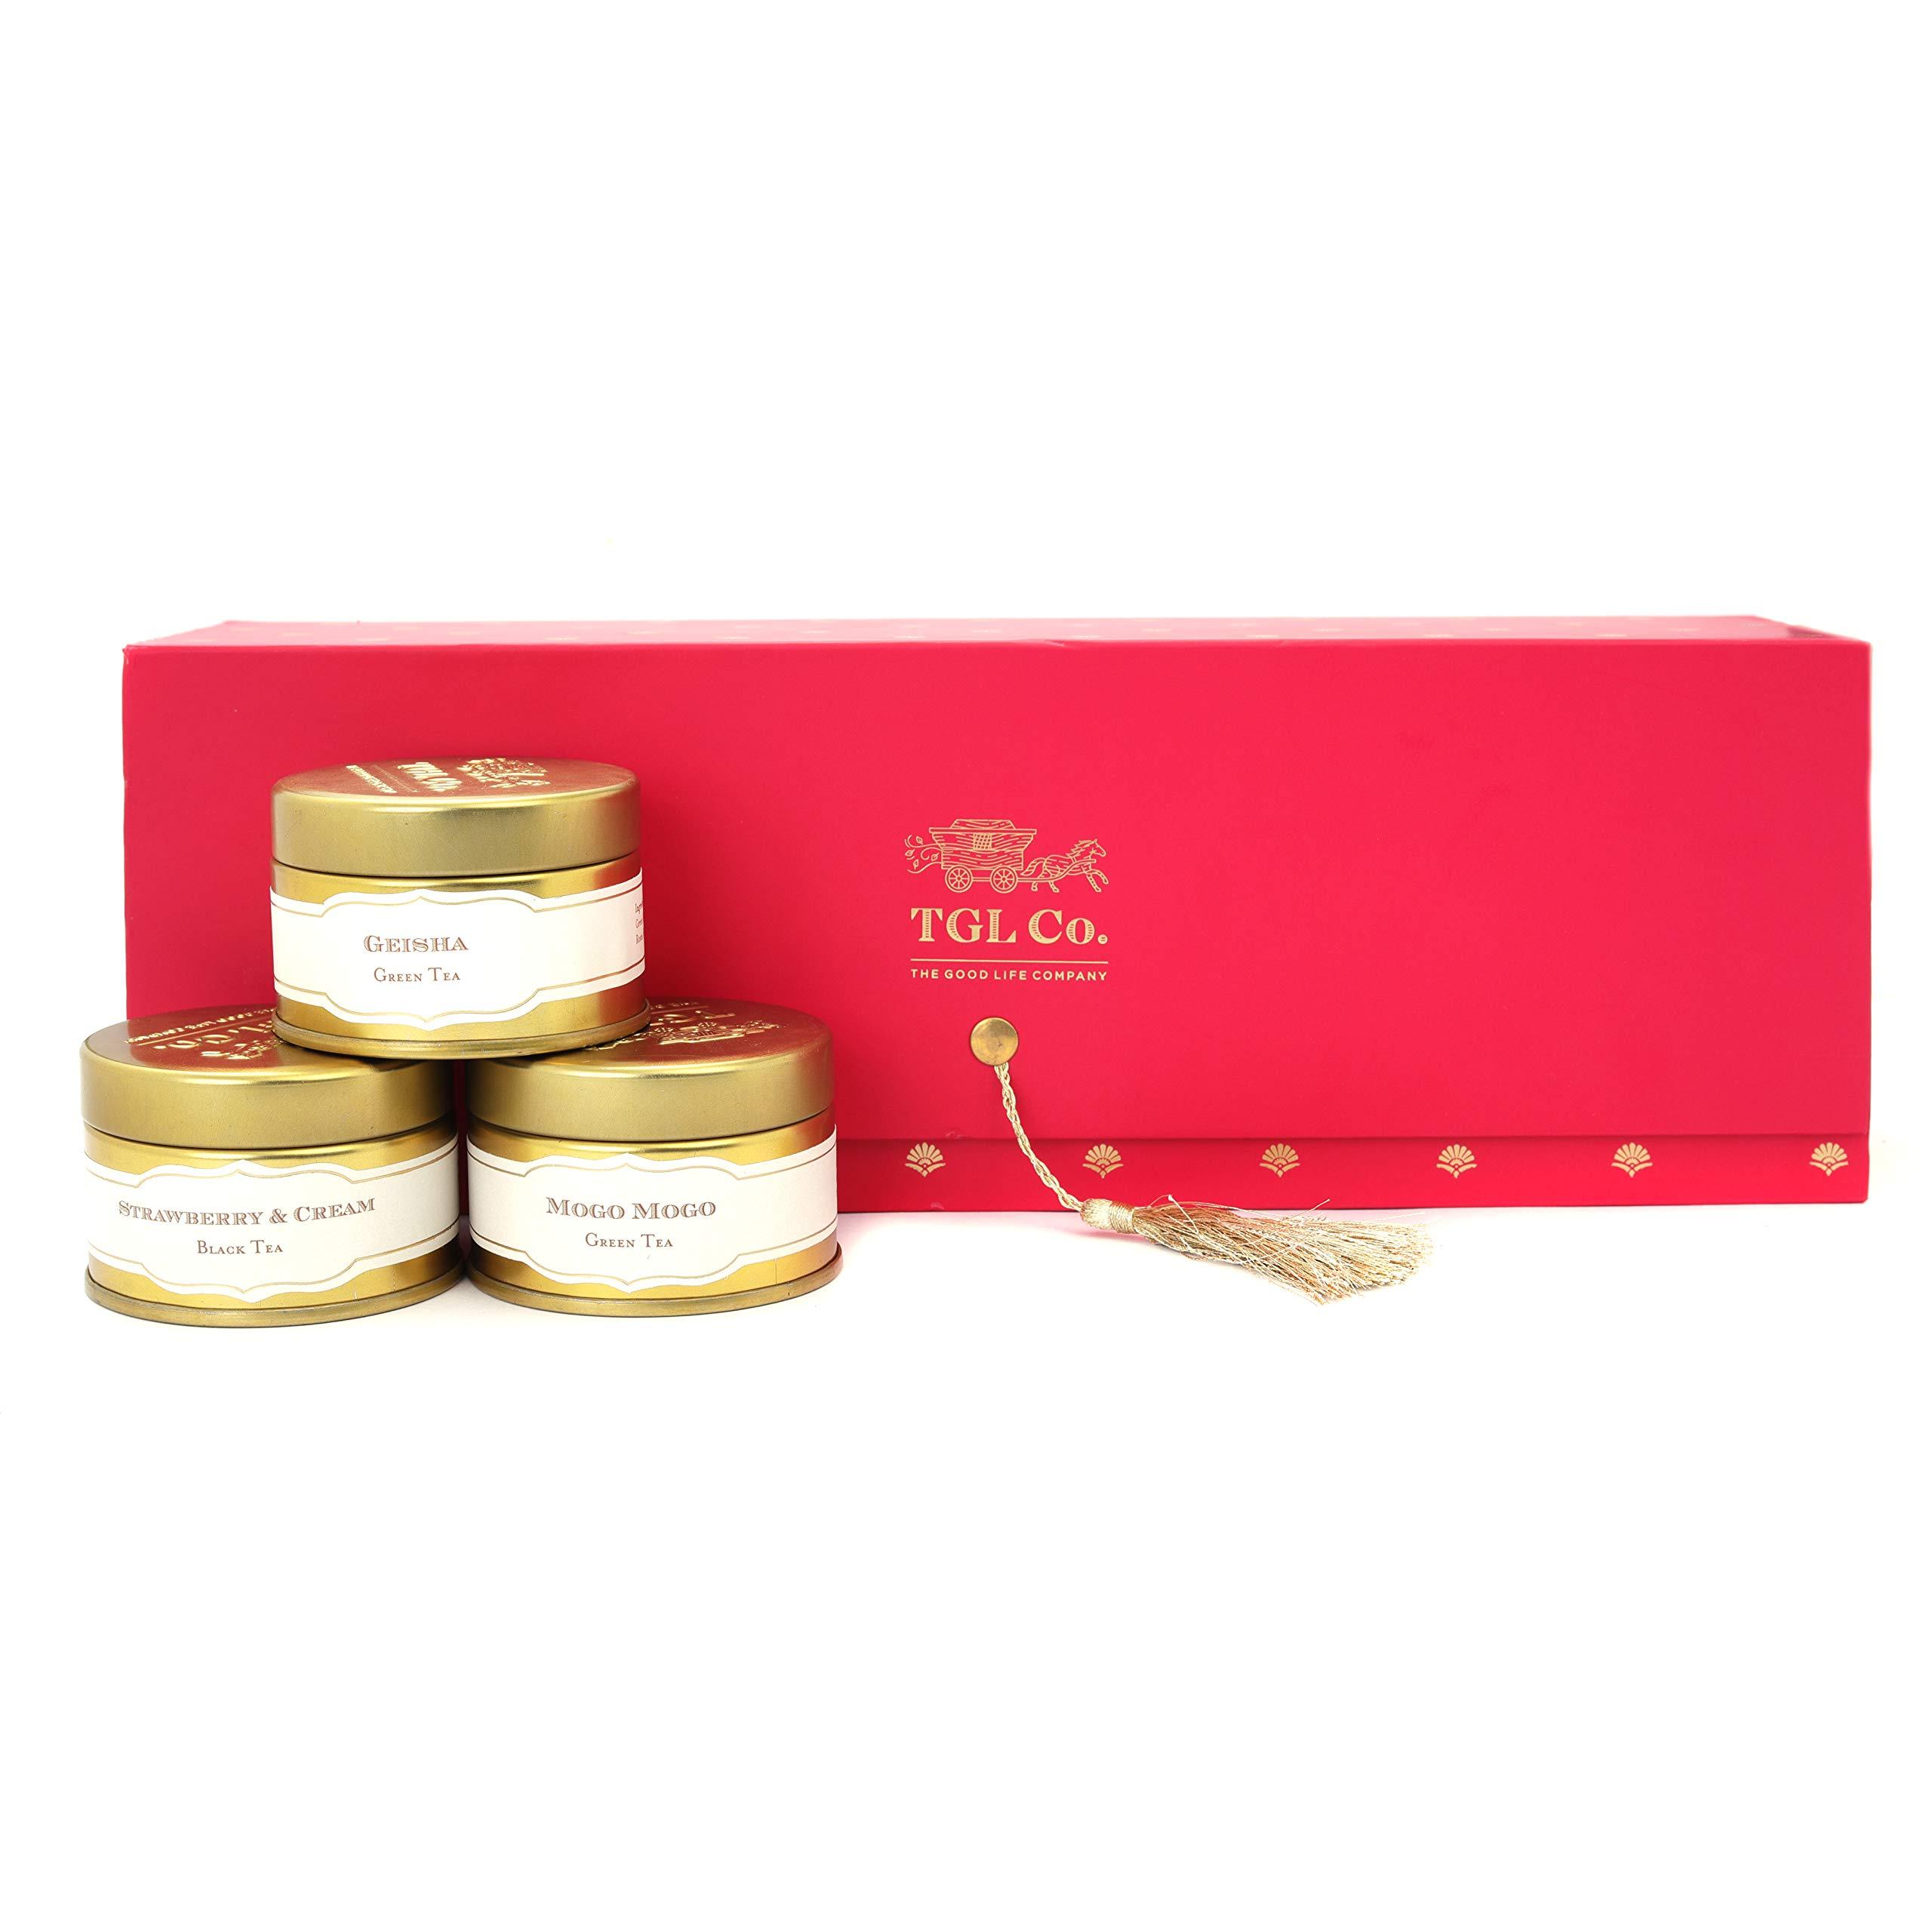 festive packaging - the good life co tea